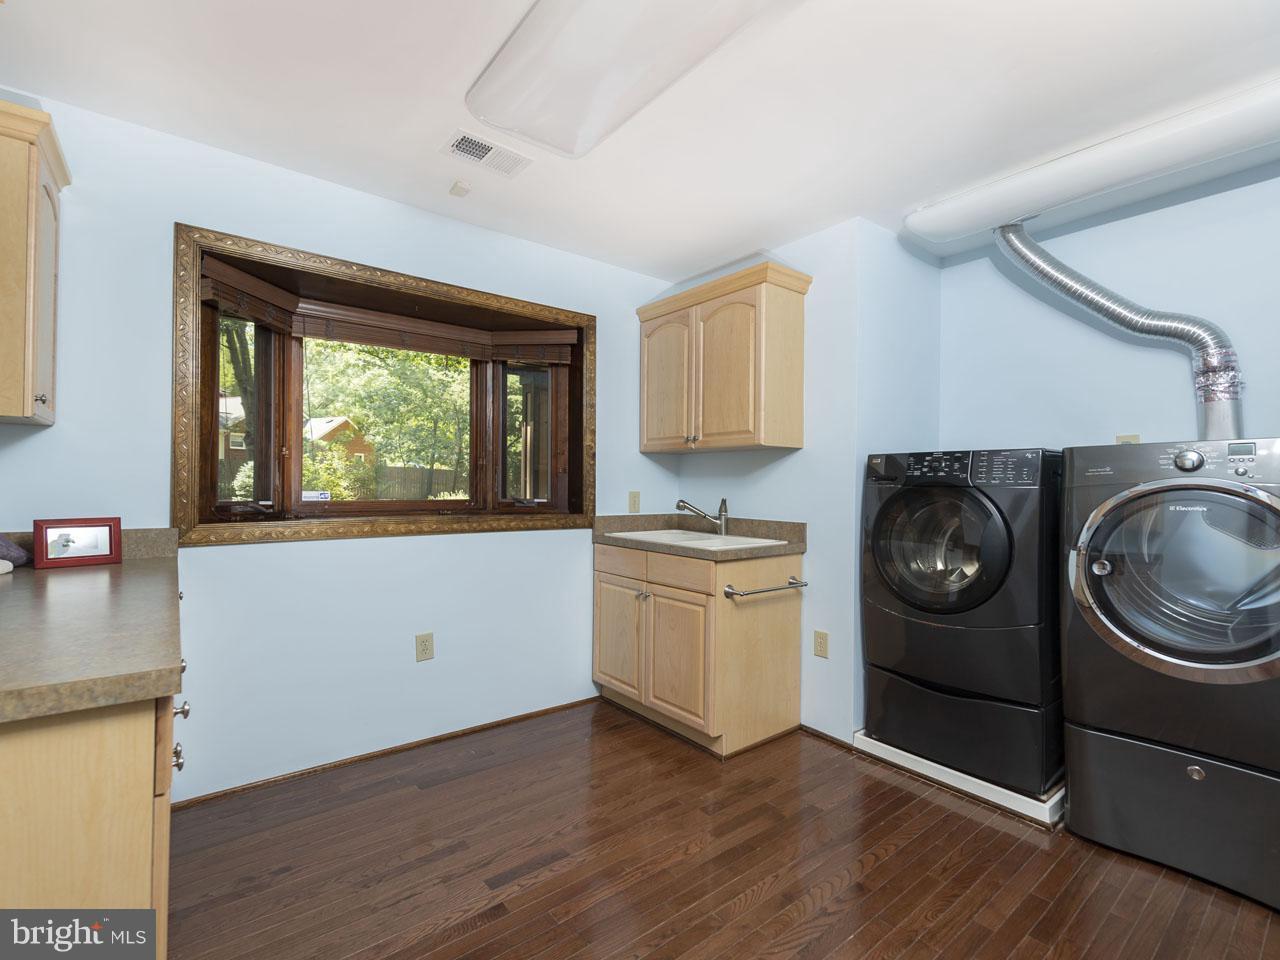 1002303700-300502418968-2021-07-22-03-27-23  |   | Alexandria Delaware Real Estate For Sale | MLS# 1002303700  - Best of Northern Virginia